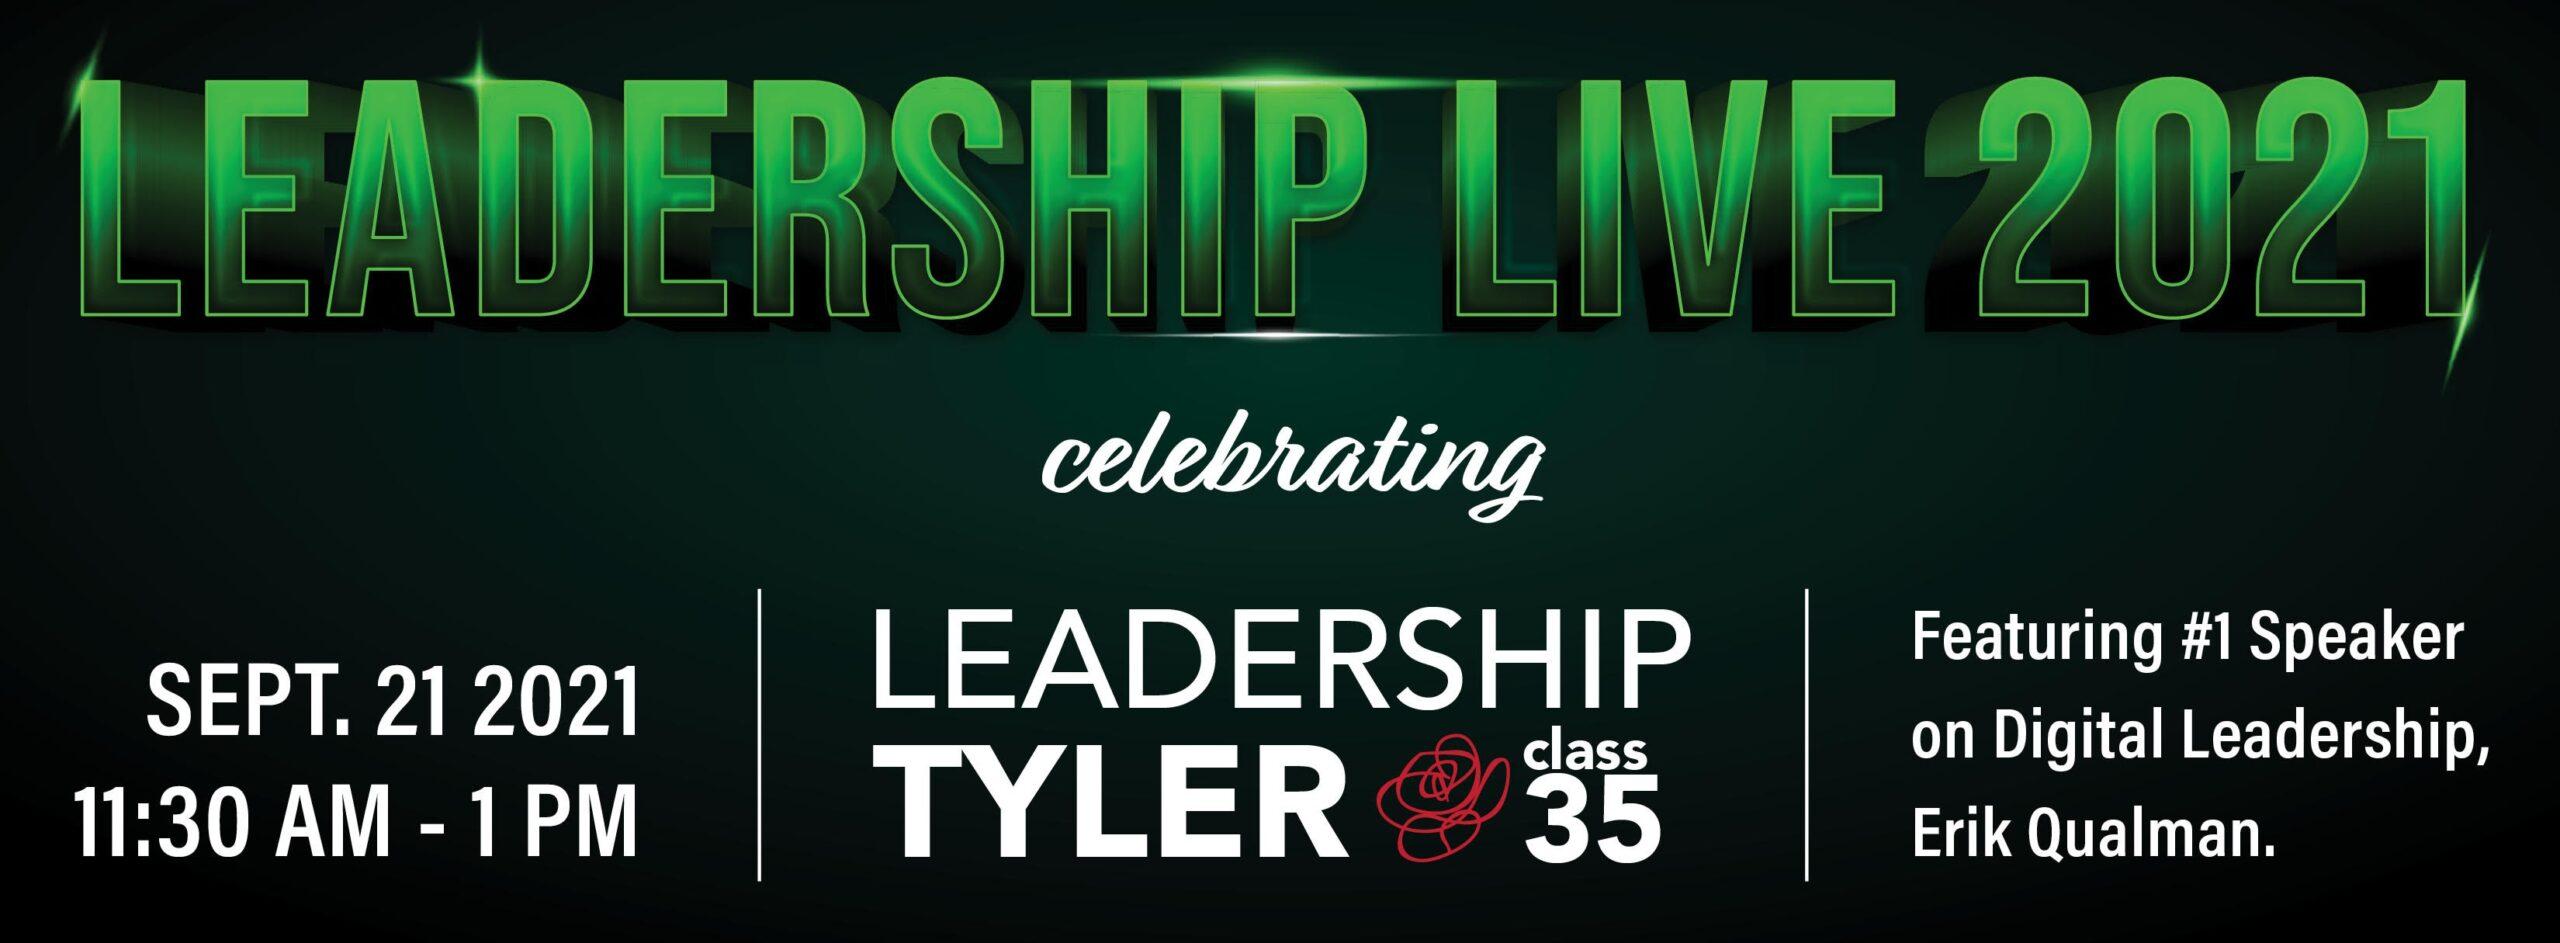 Leadership-Live-2021-scaled